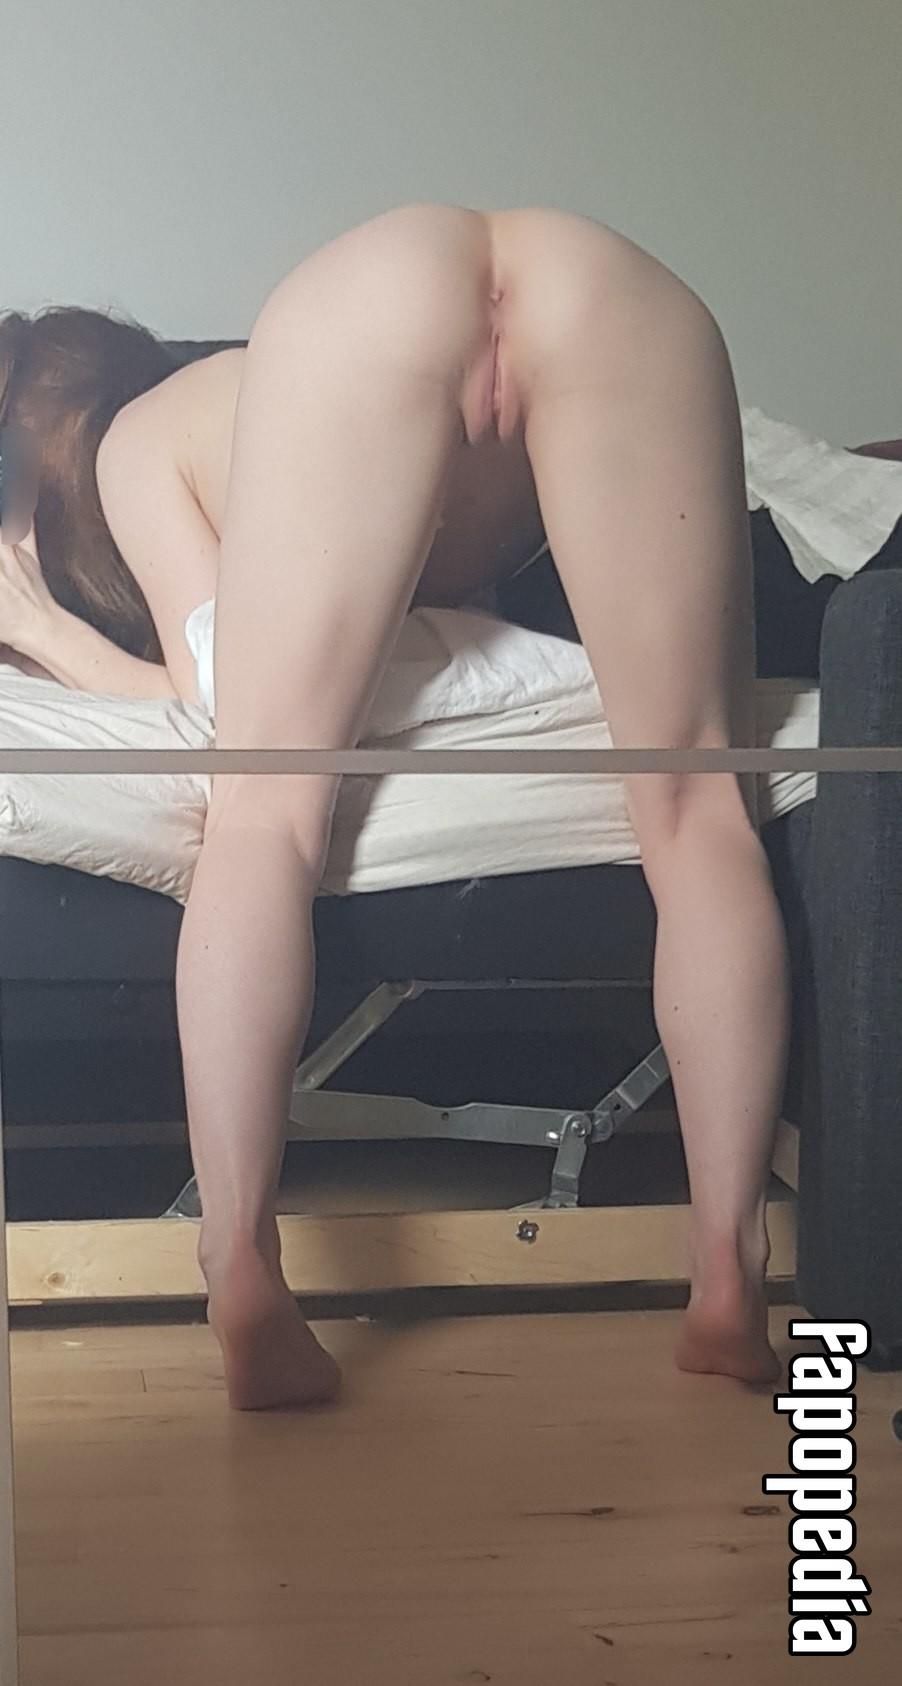 TameMeIfUCan Nude Leaks